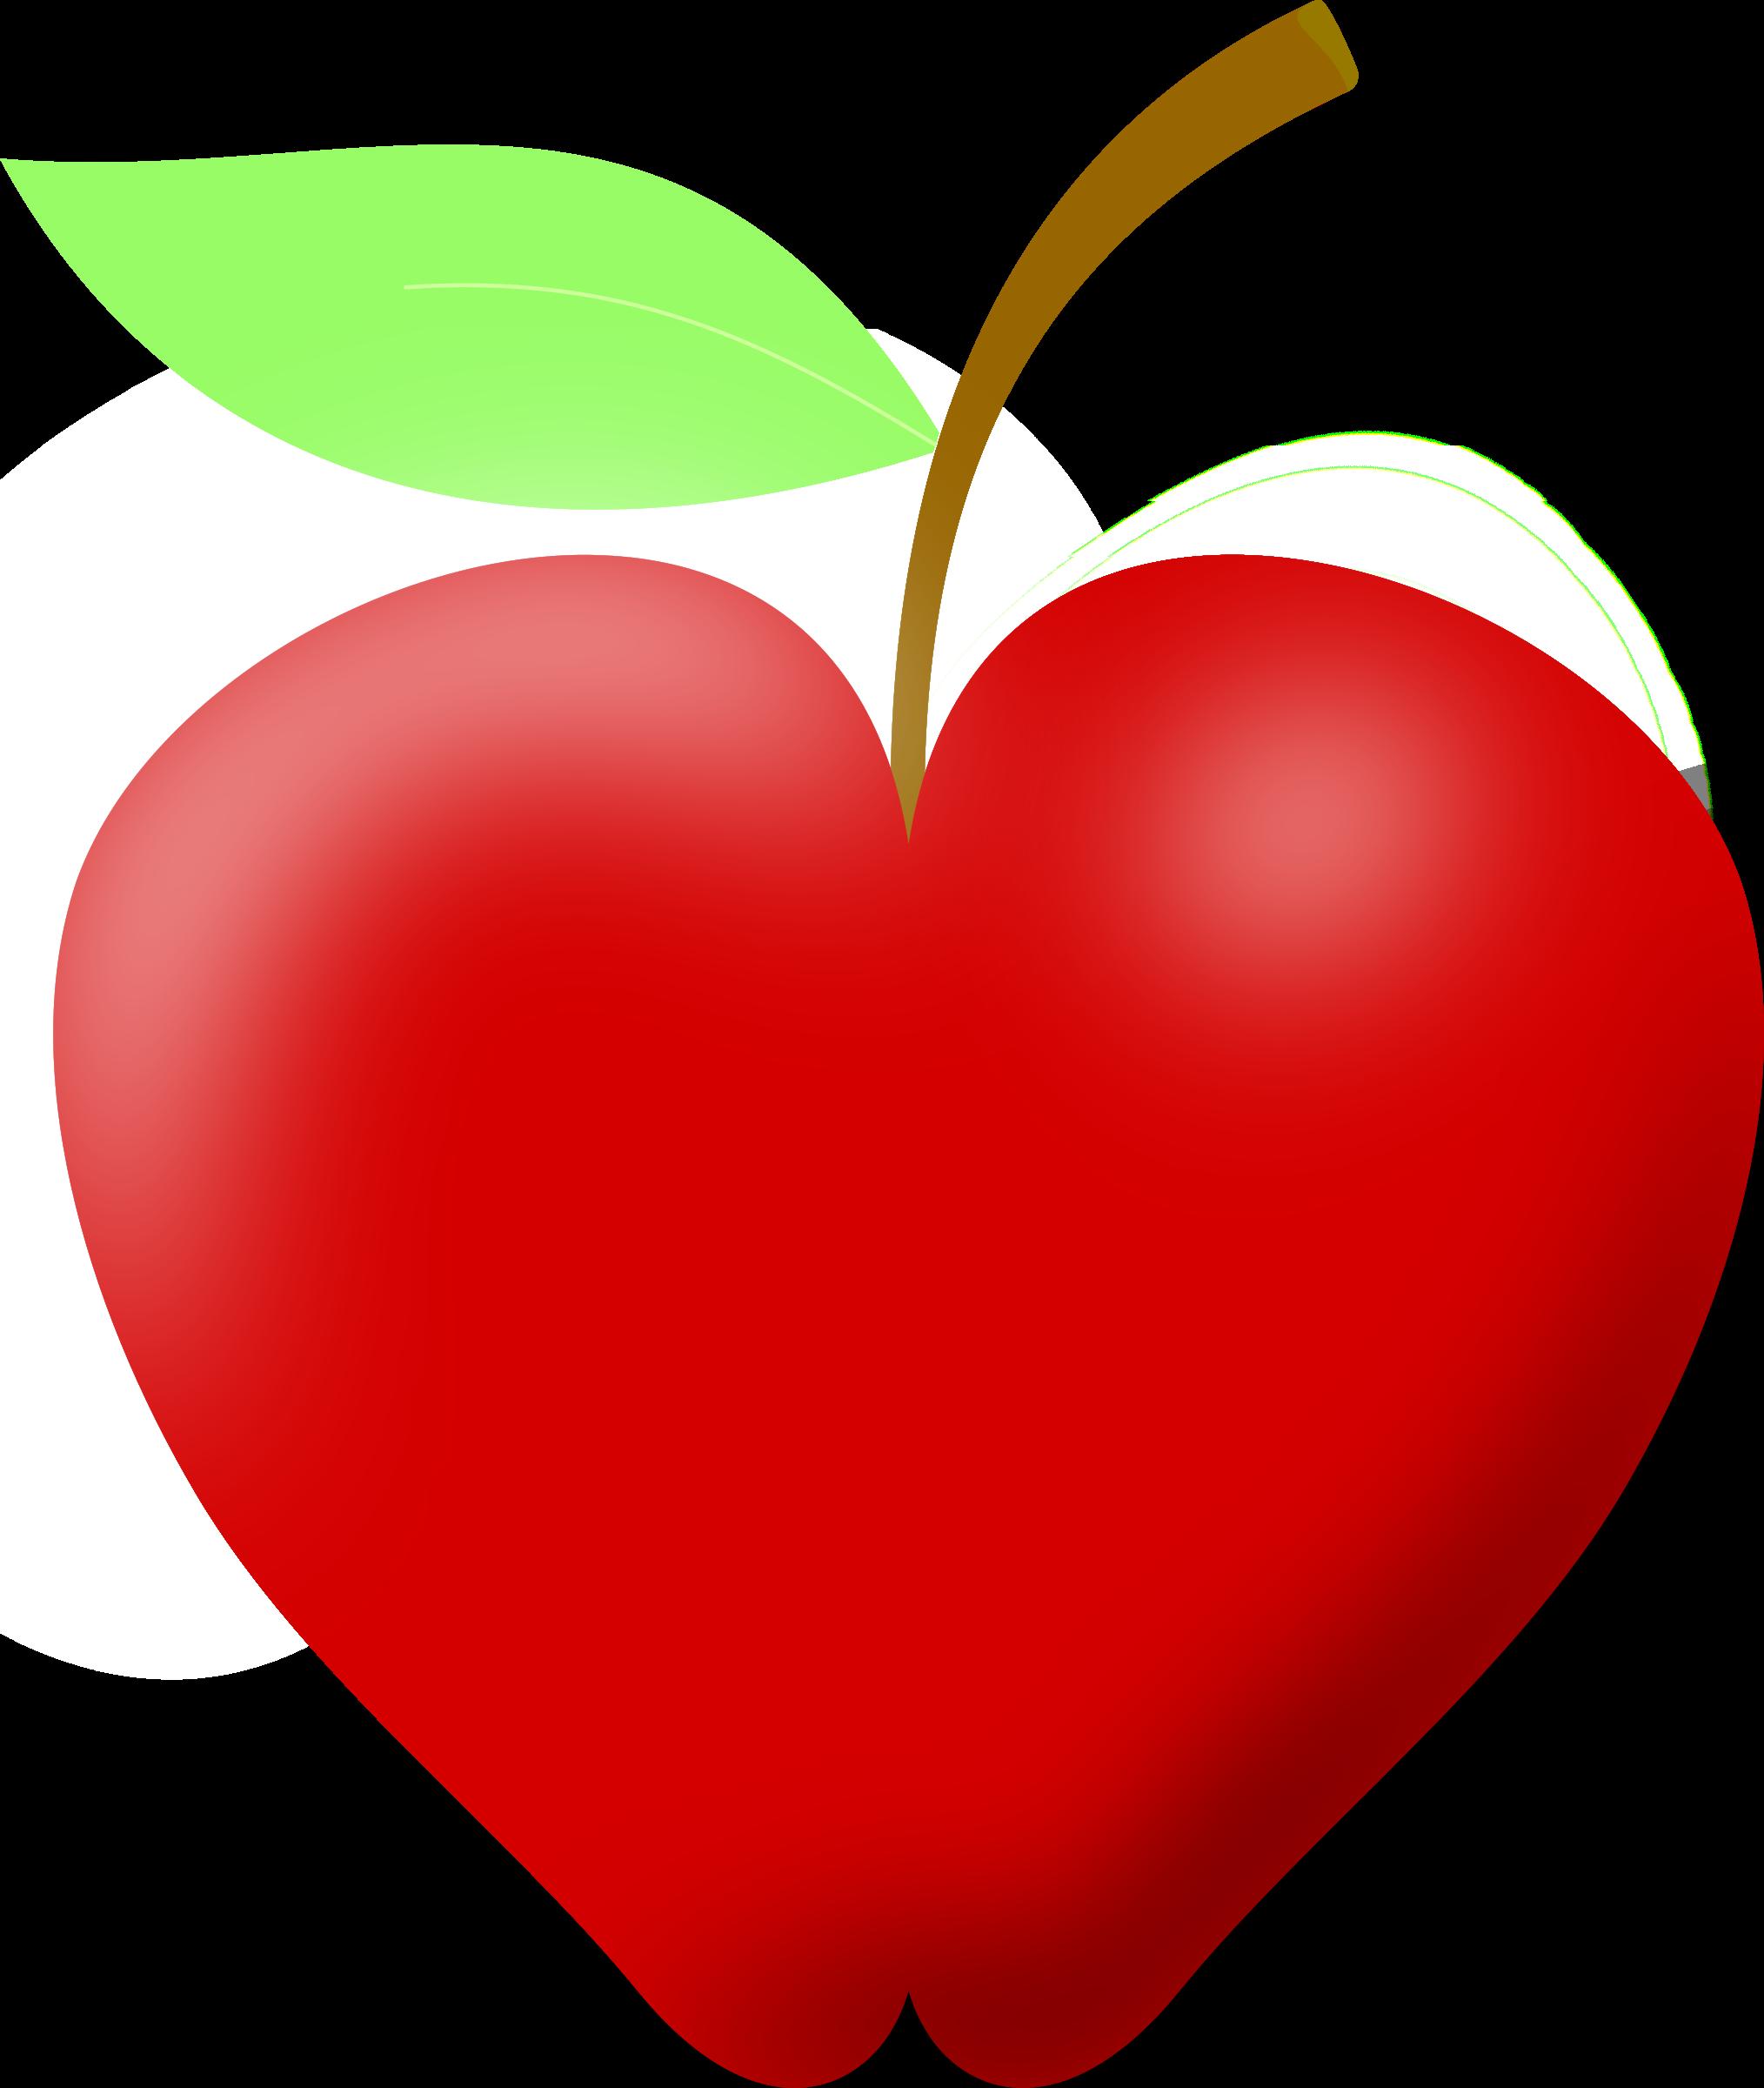 Heart clipart apple 2 Clip art